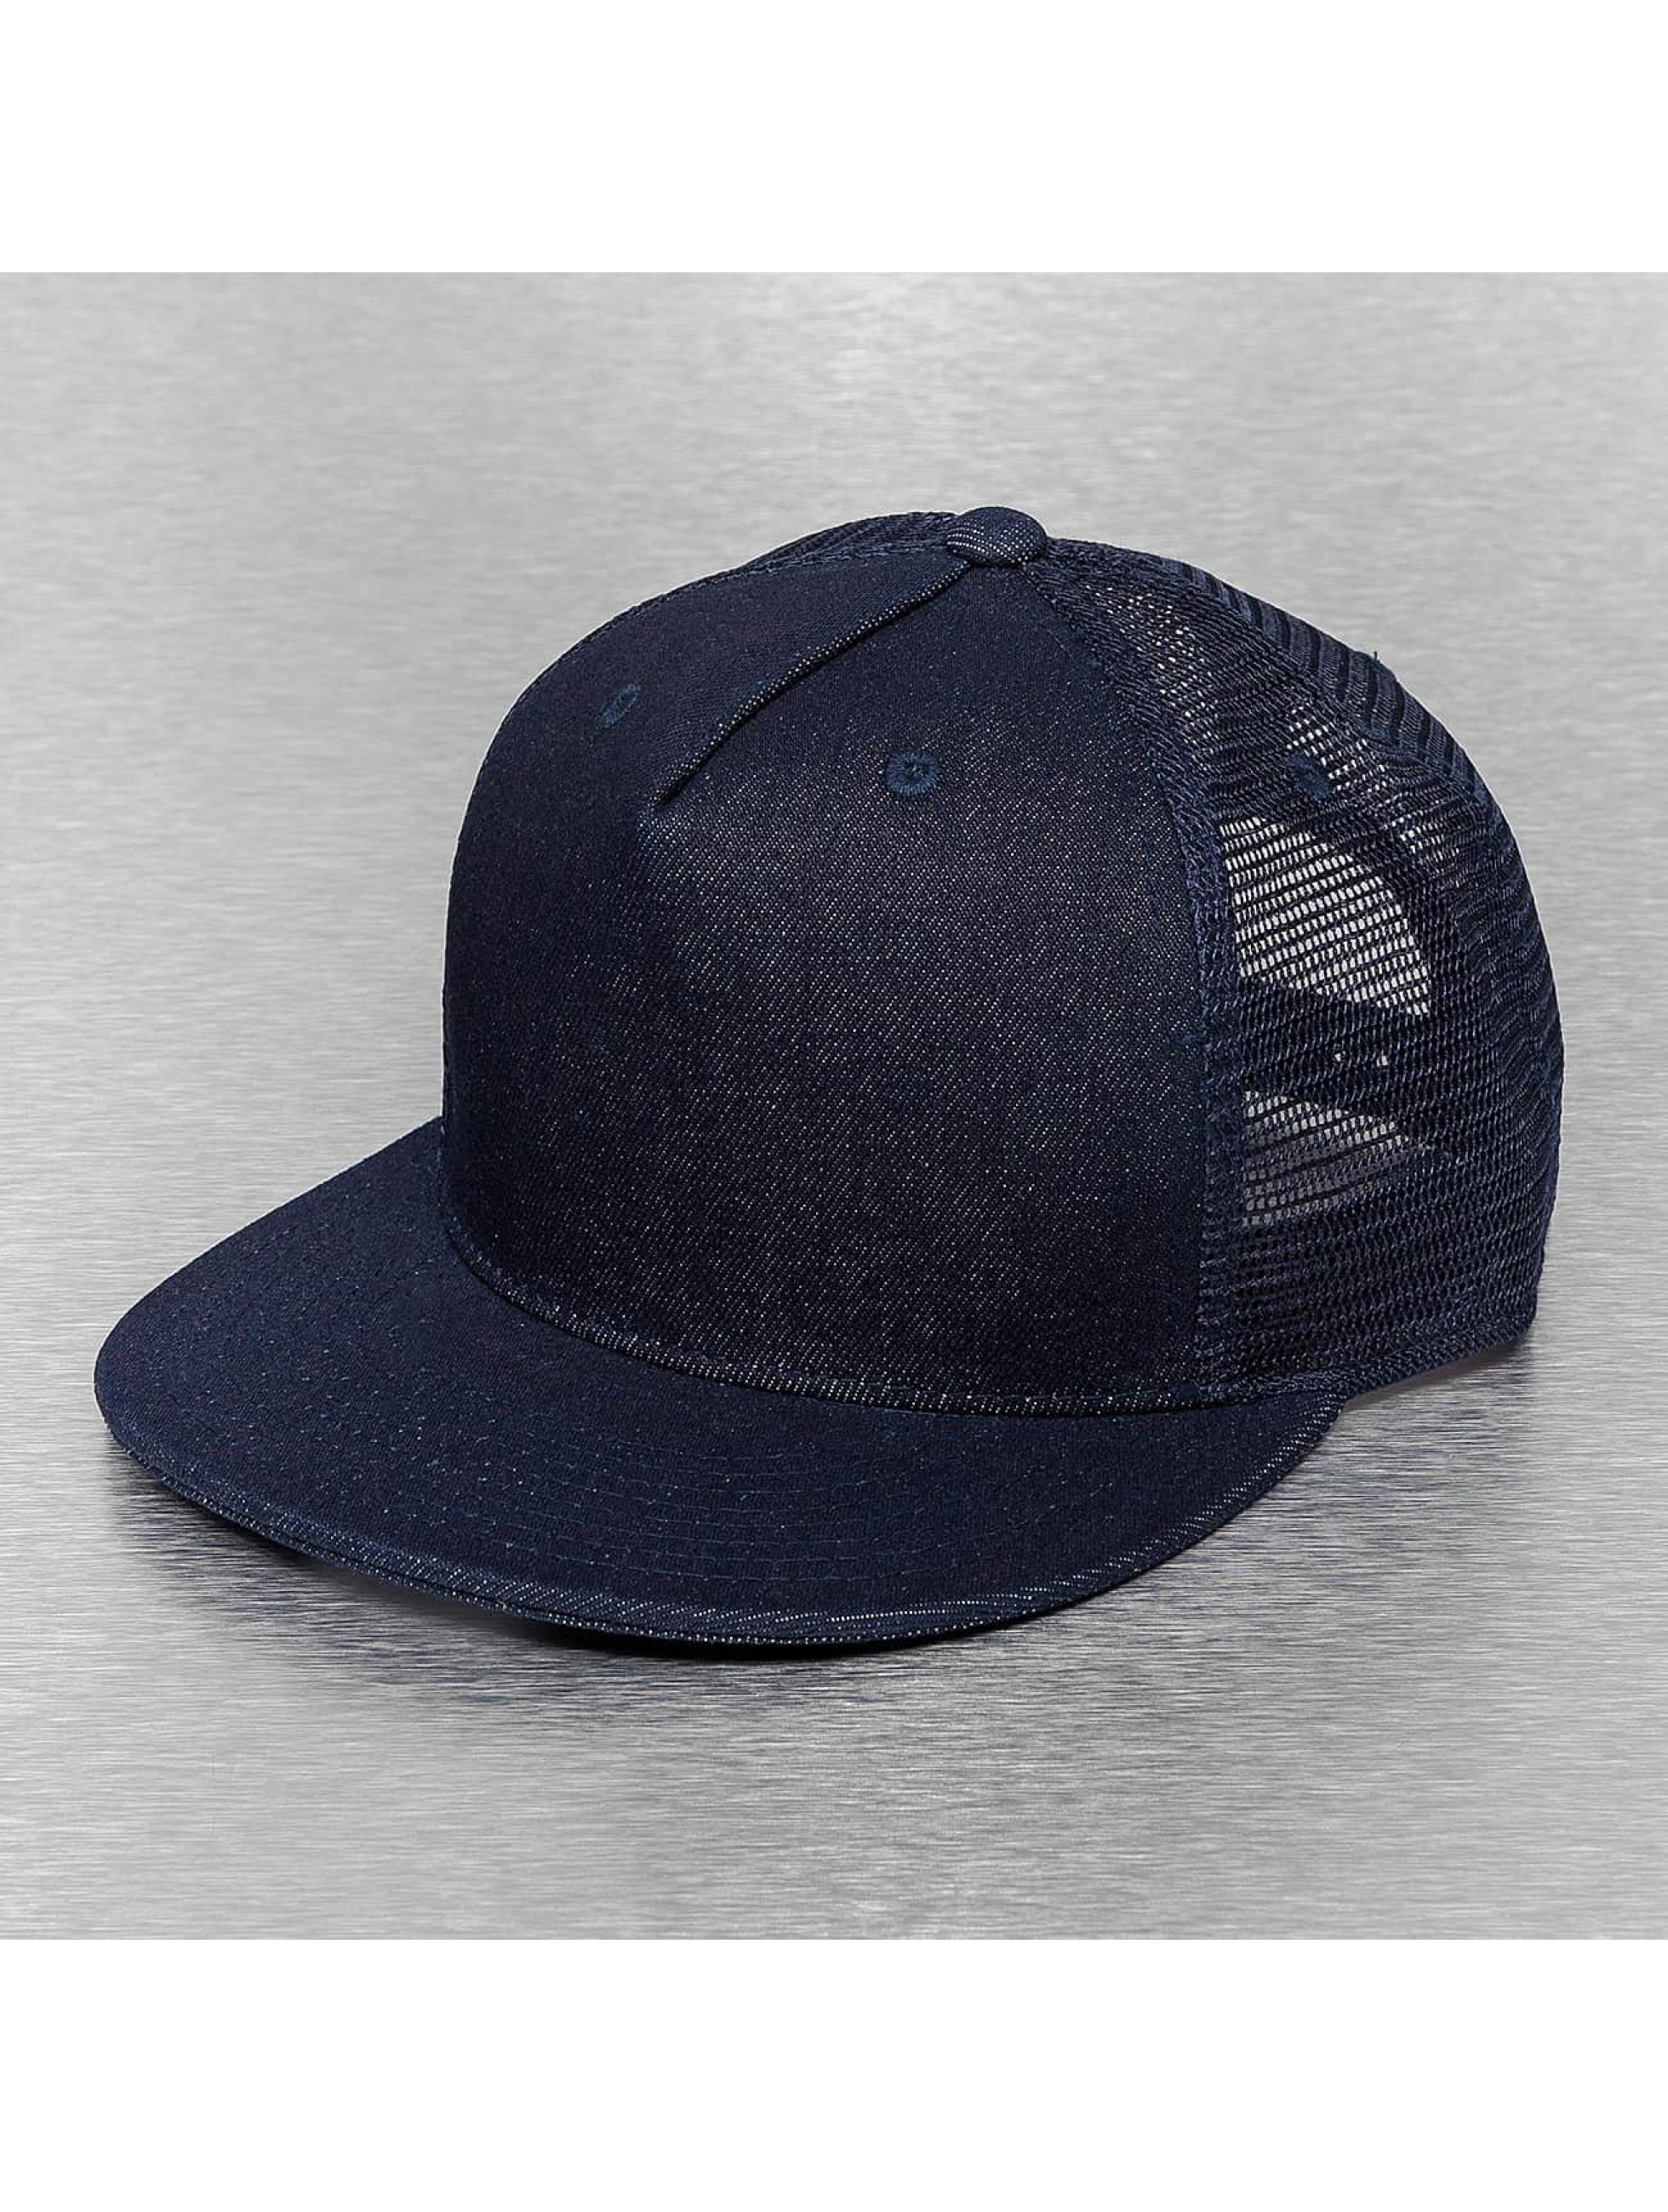 Cap Crony Verkkolippikset Denim sininen